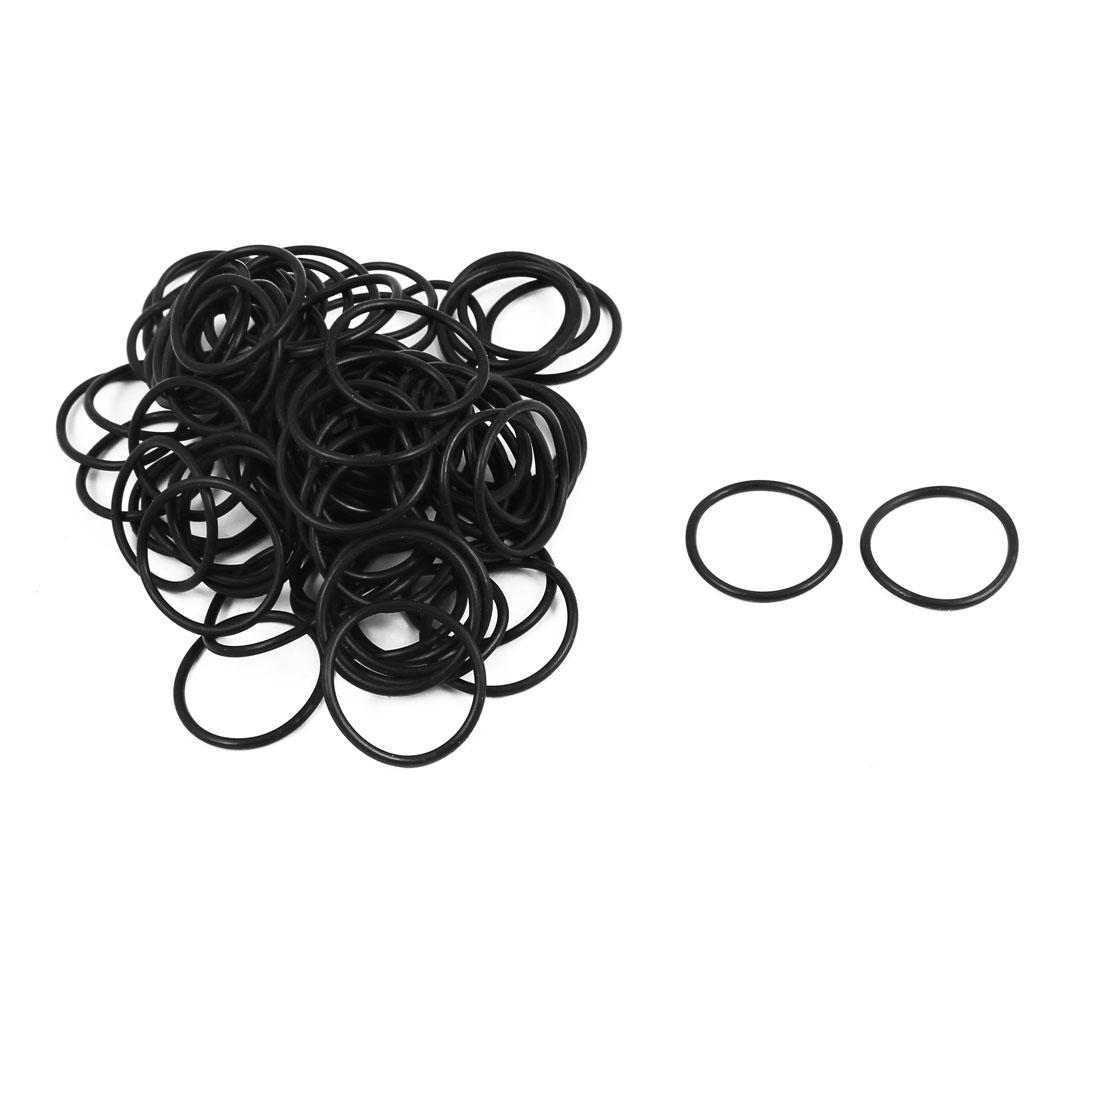 100Pcs Black 21mm x 1.5mm Nitrile Rubber O Ring NBR Oil Sealing Grommets